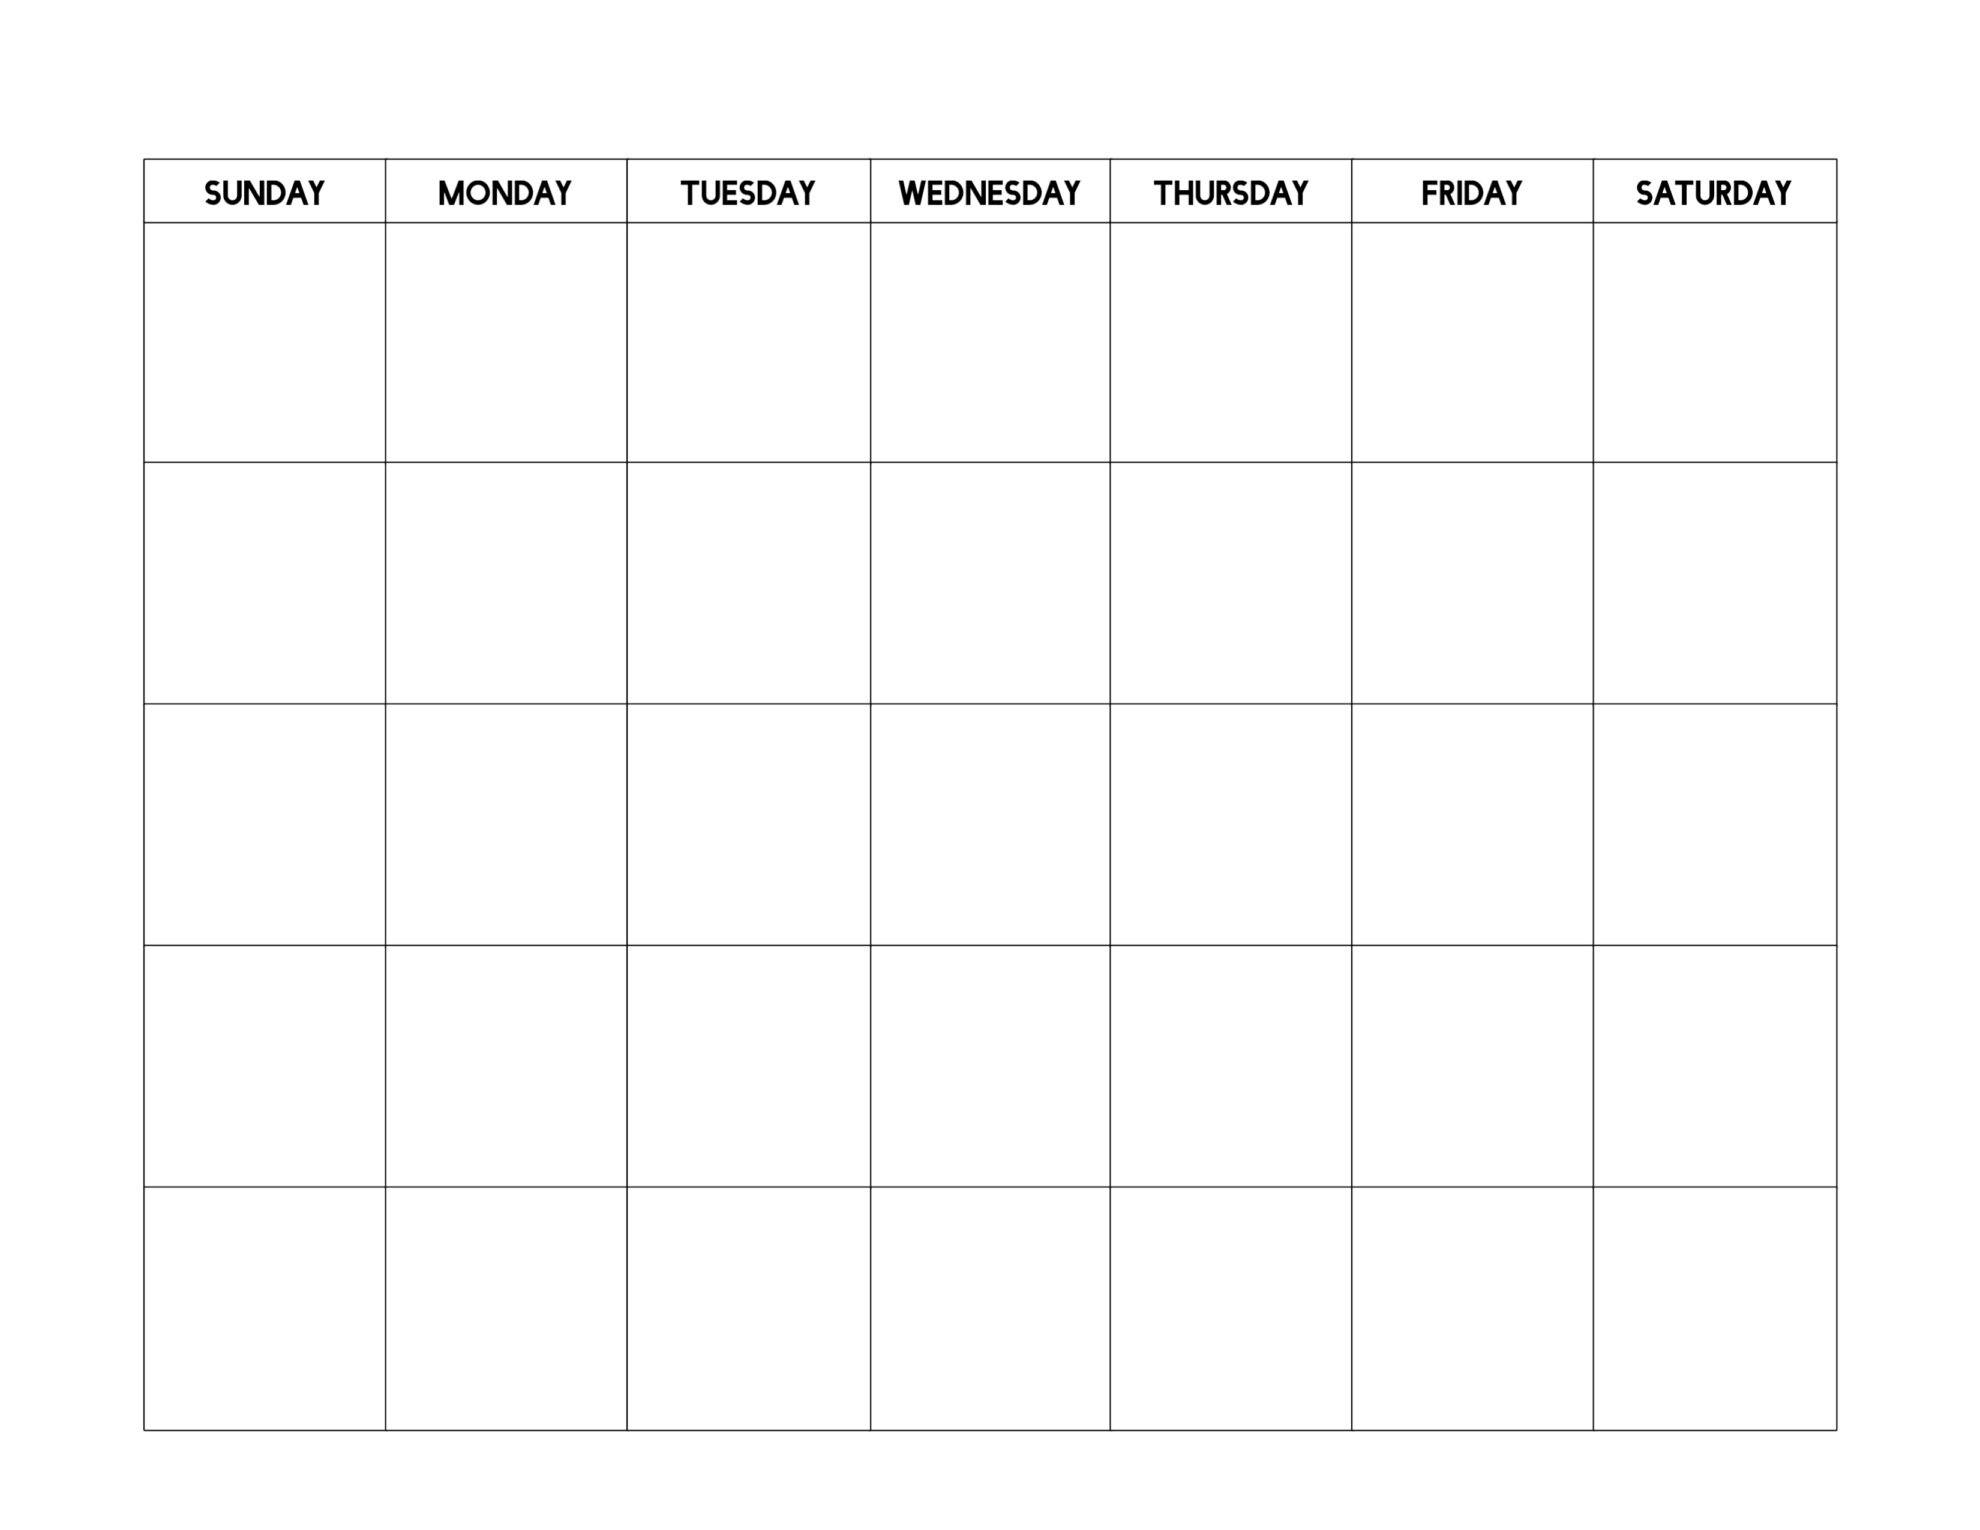 Free Printable Blank Calendar Template | Paper Trail Design  Full Page Blank Calendar